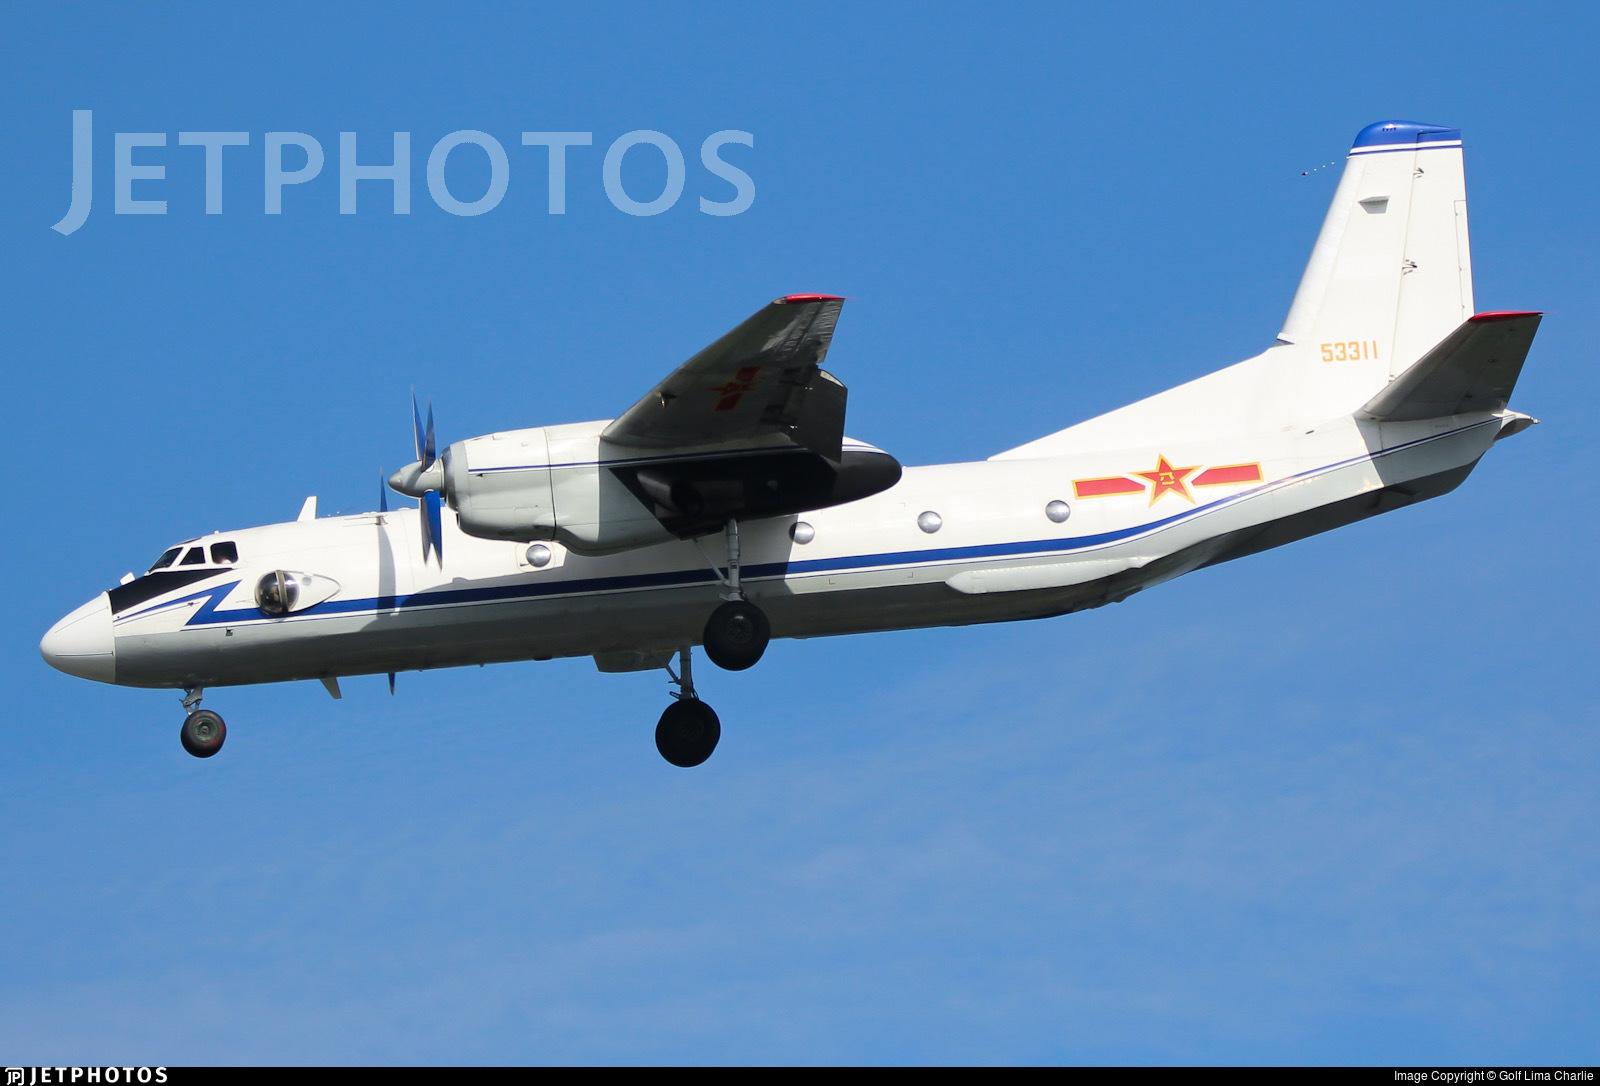 53311 - Xian Y-7 - China - Air Force